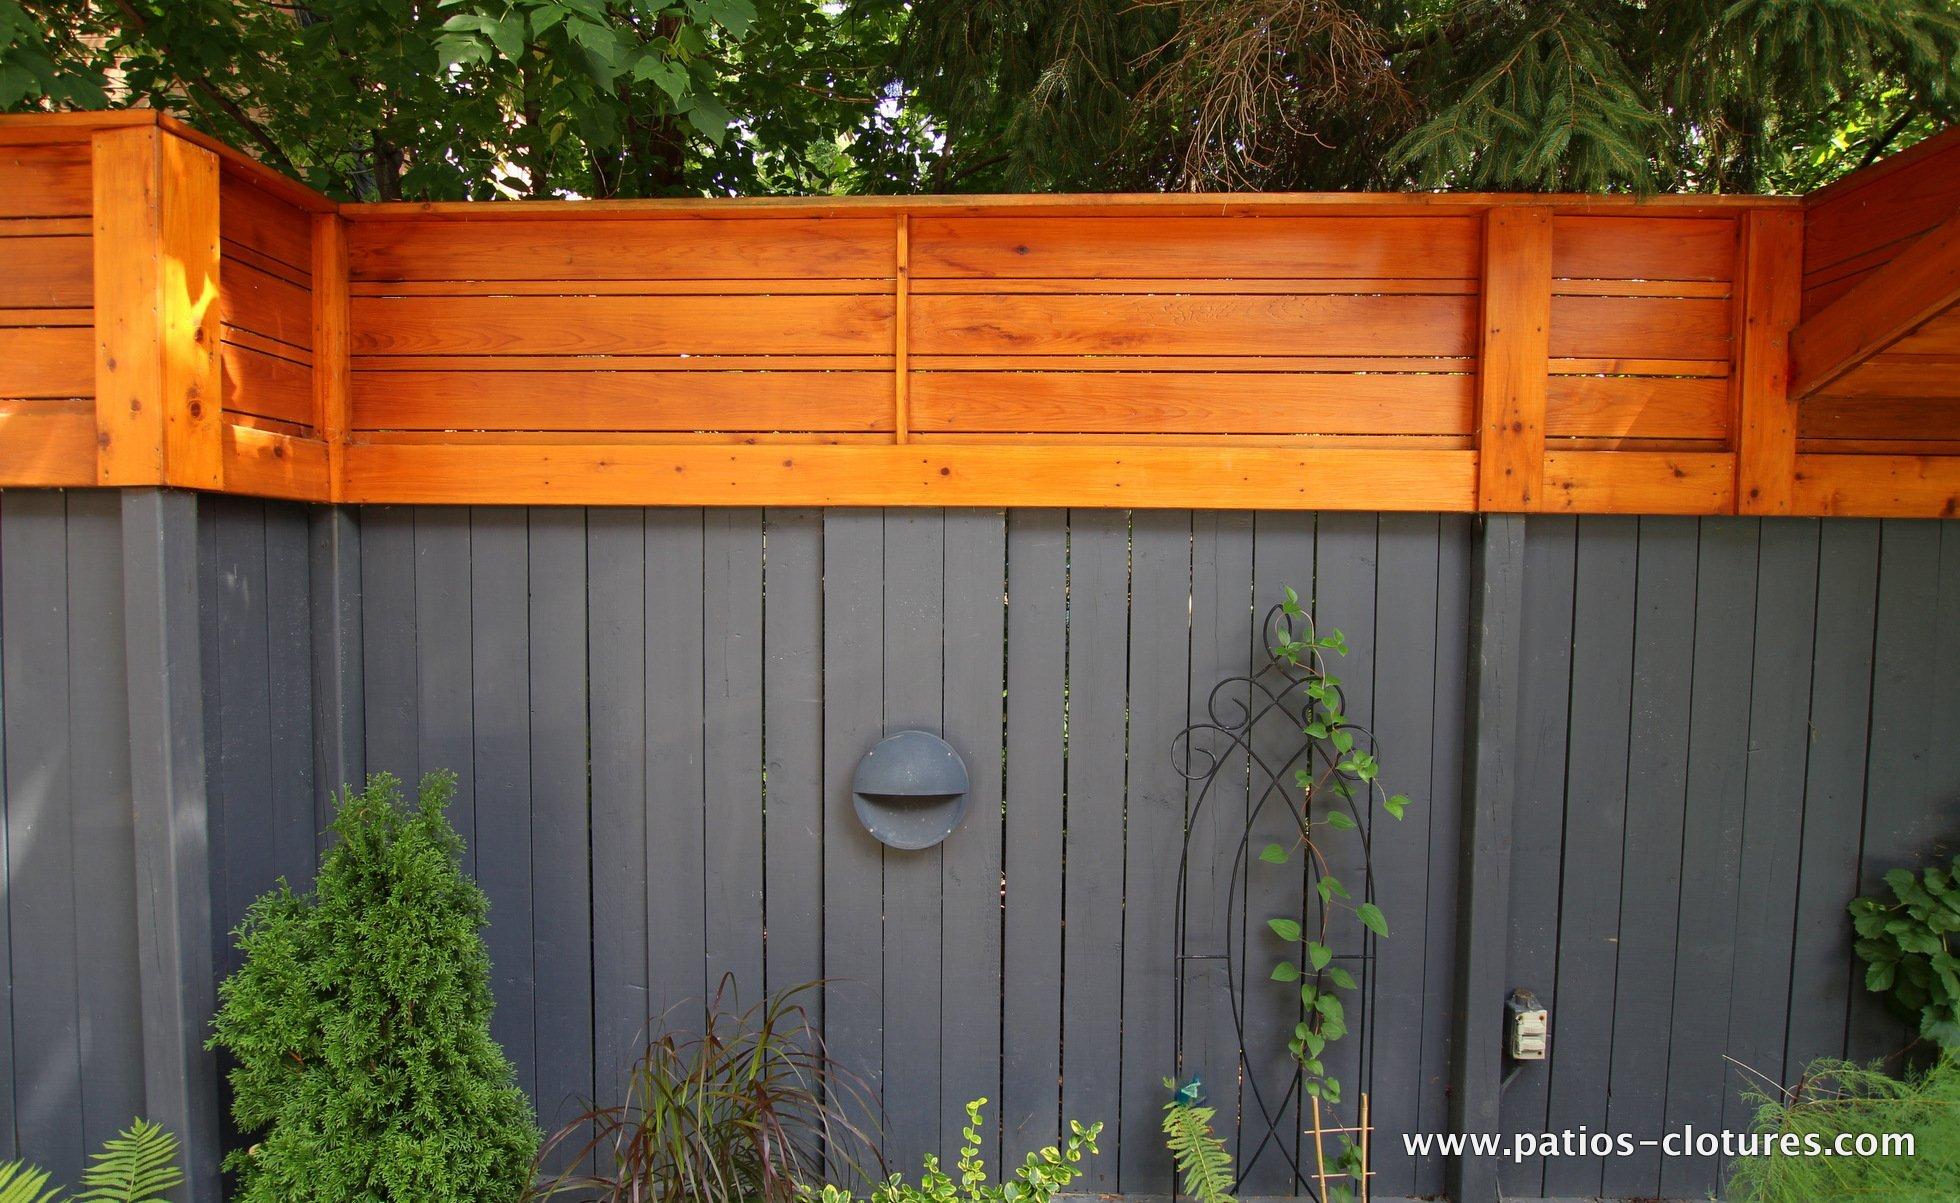 Wooden Fences Pictures